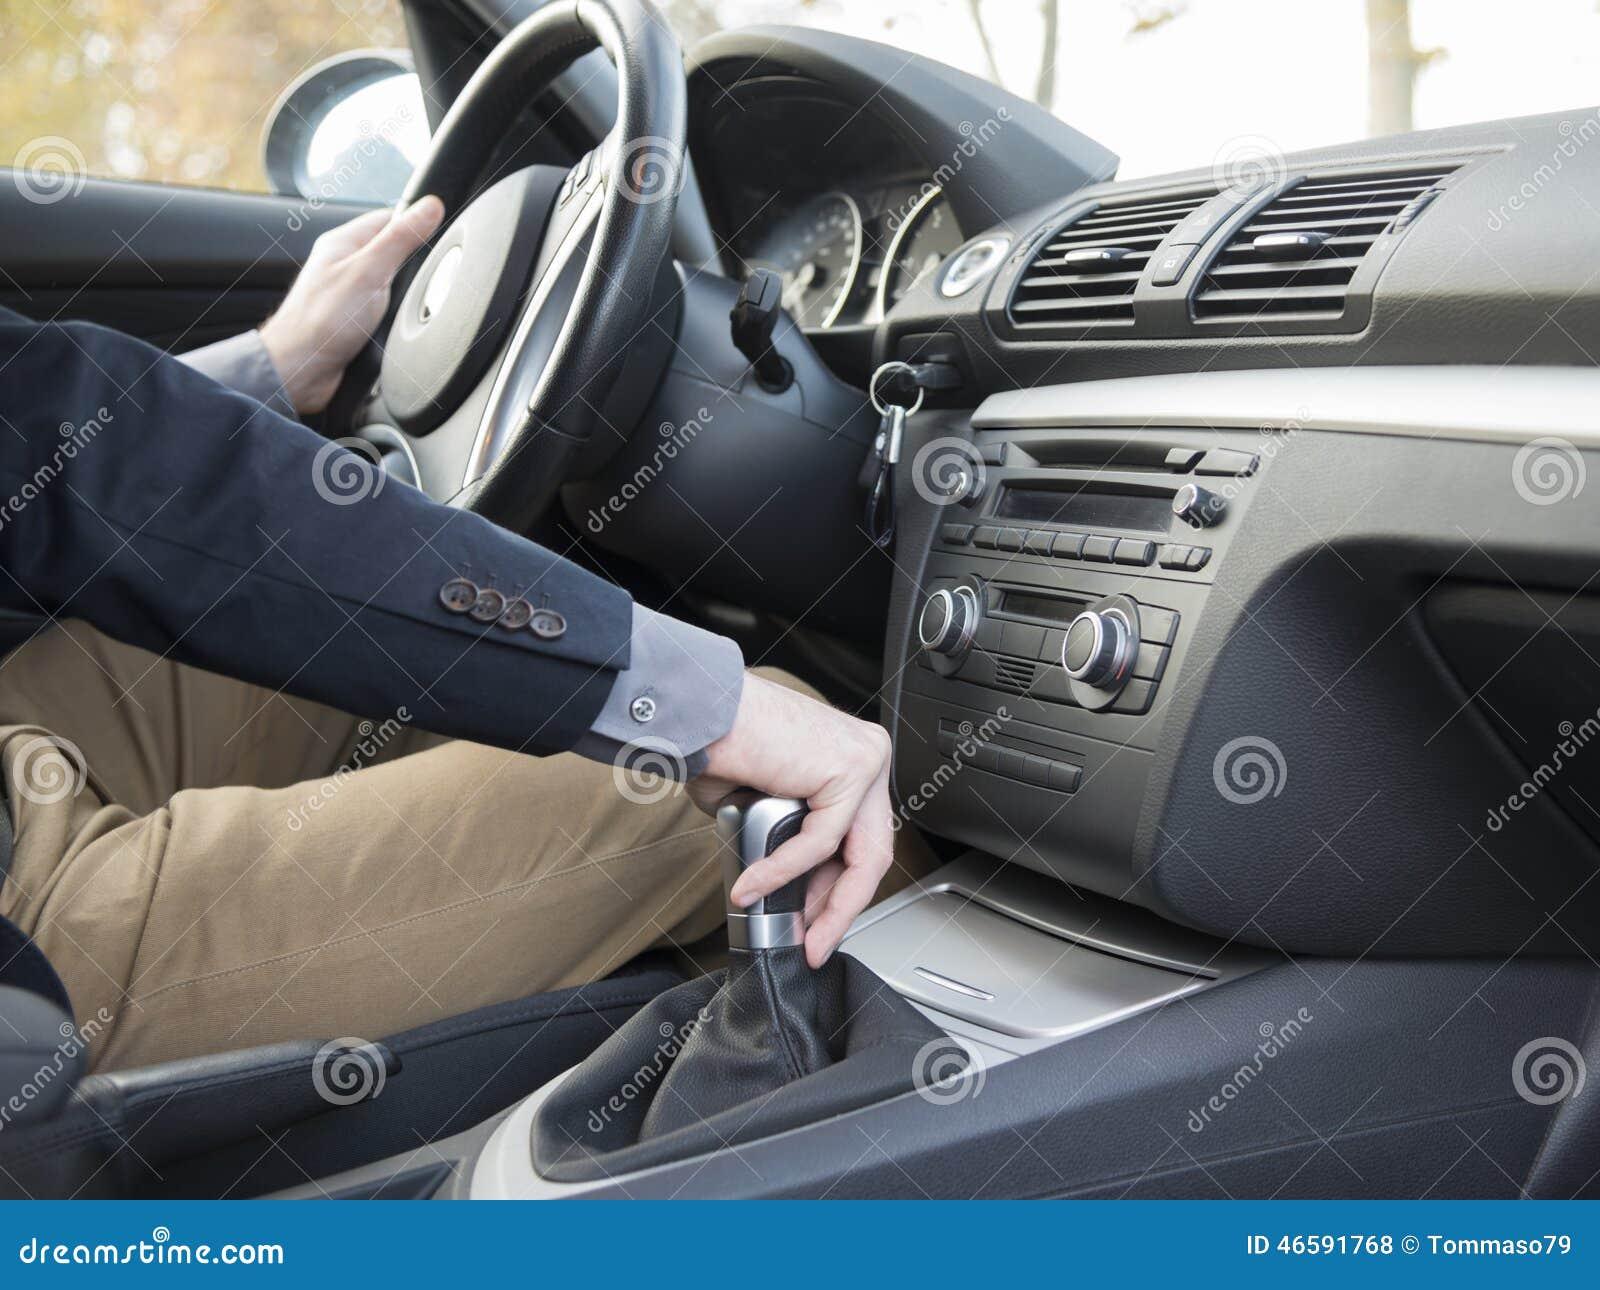 man driving modern sport car royalty free stock image 5369806. Black Bedroom Furniture Sets. Home Design Ideas